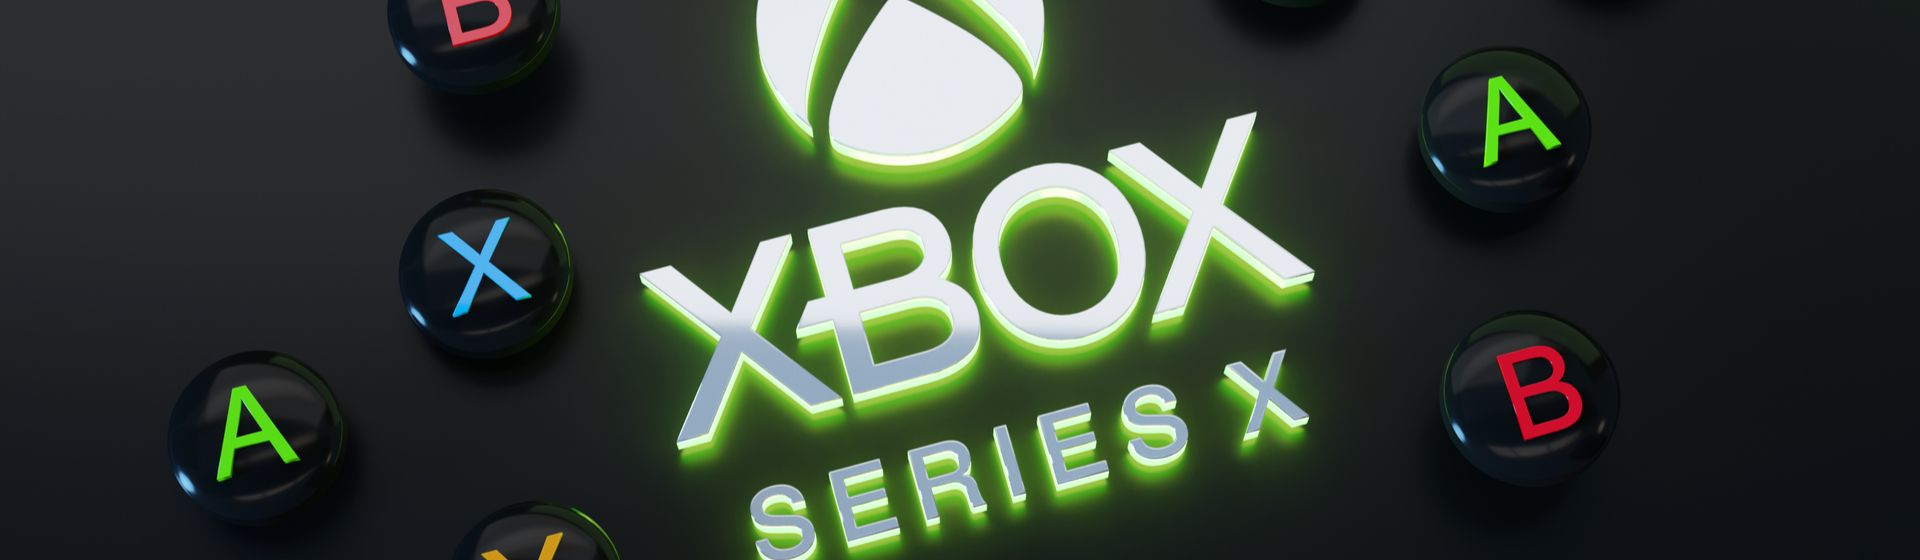 Xbox All Access no Brasil? Serviço promete popularizar Series X e S